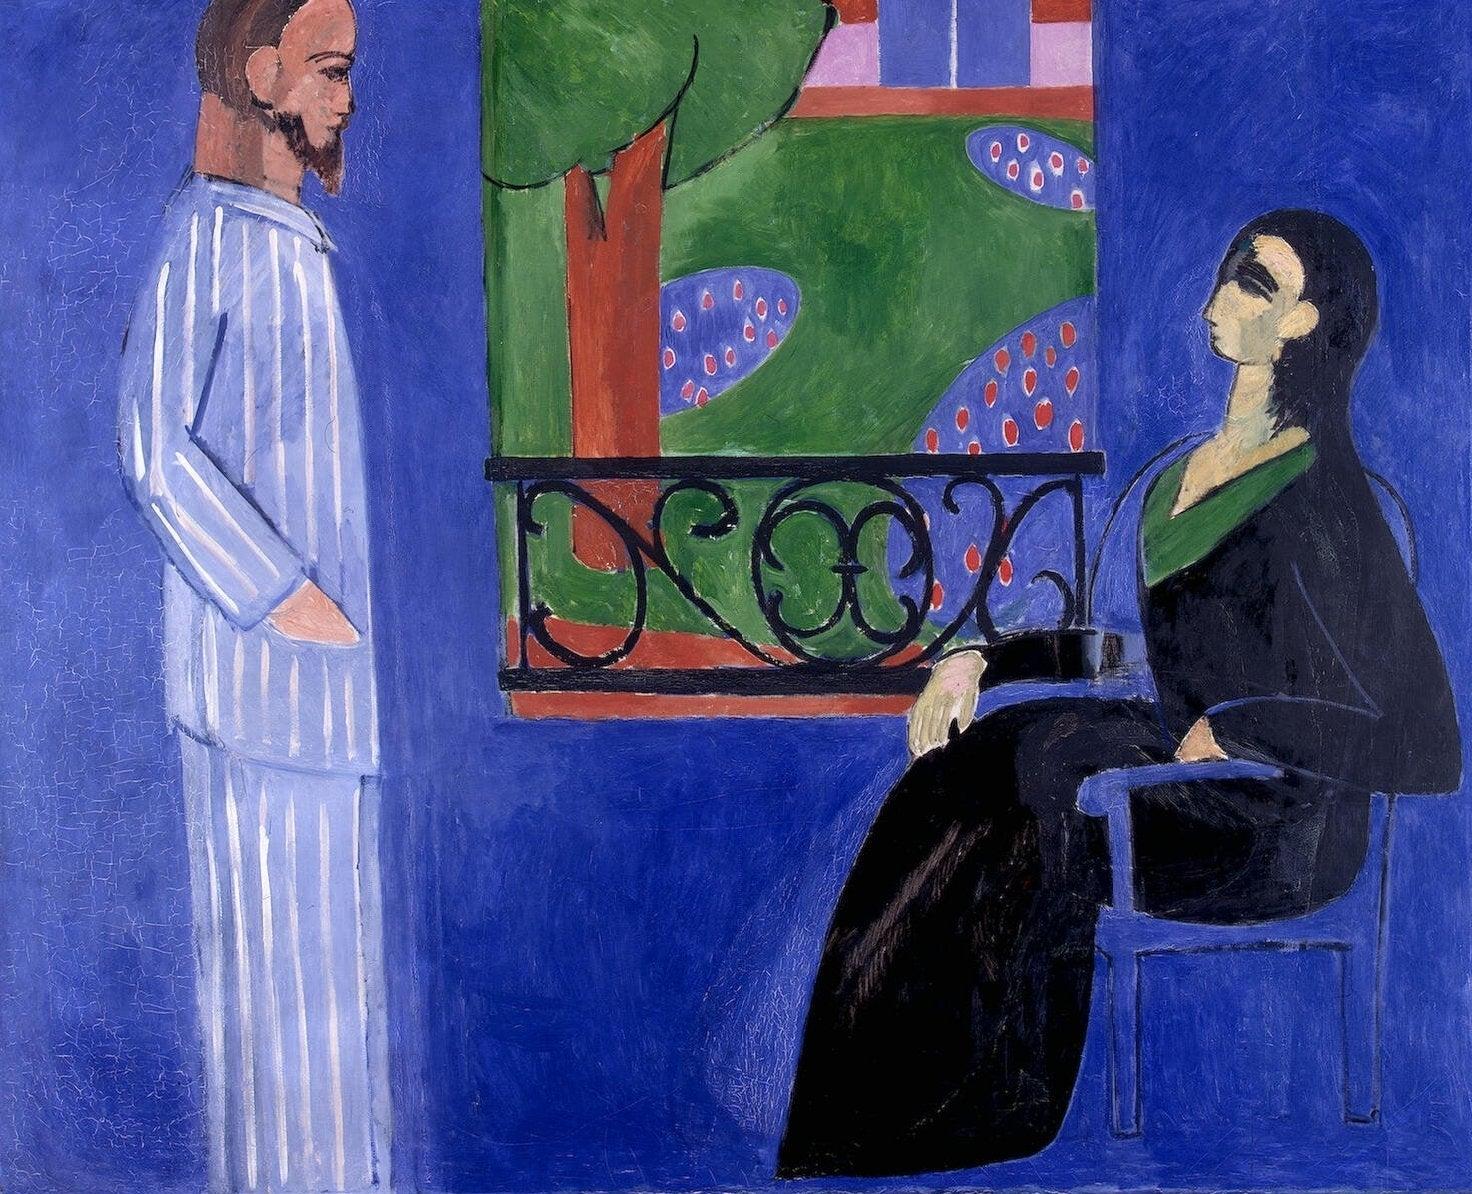 Henri Matisse's Conversation (1908-1912) at the State Hermitage Museum, St Petersburg